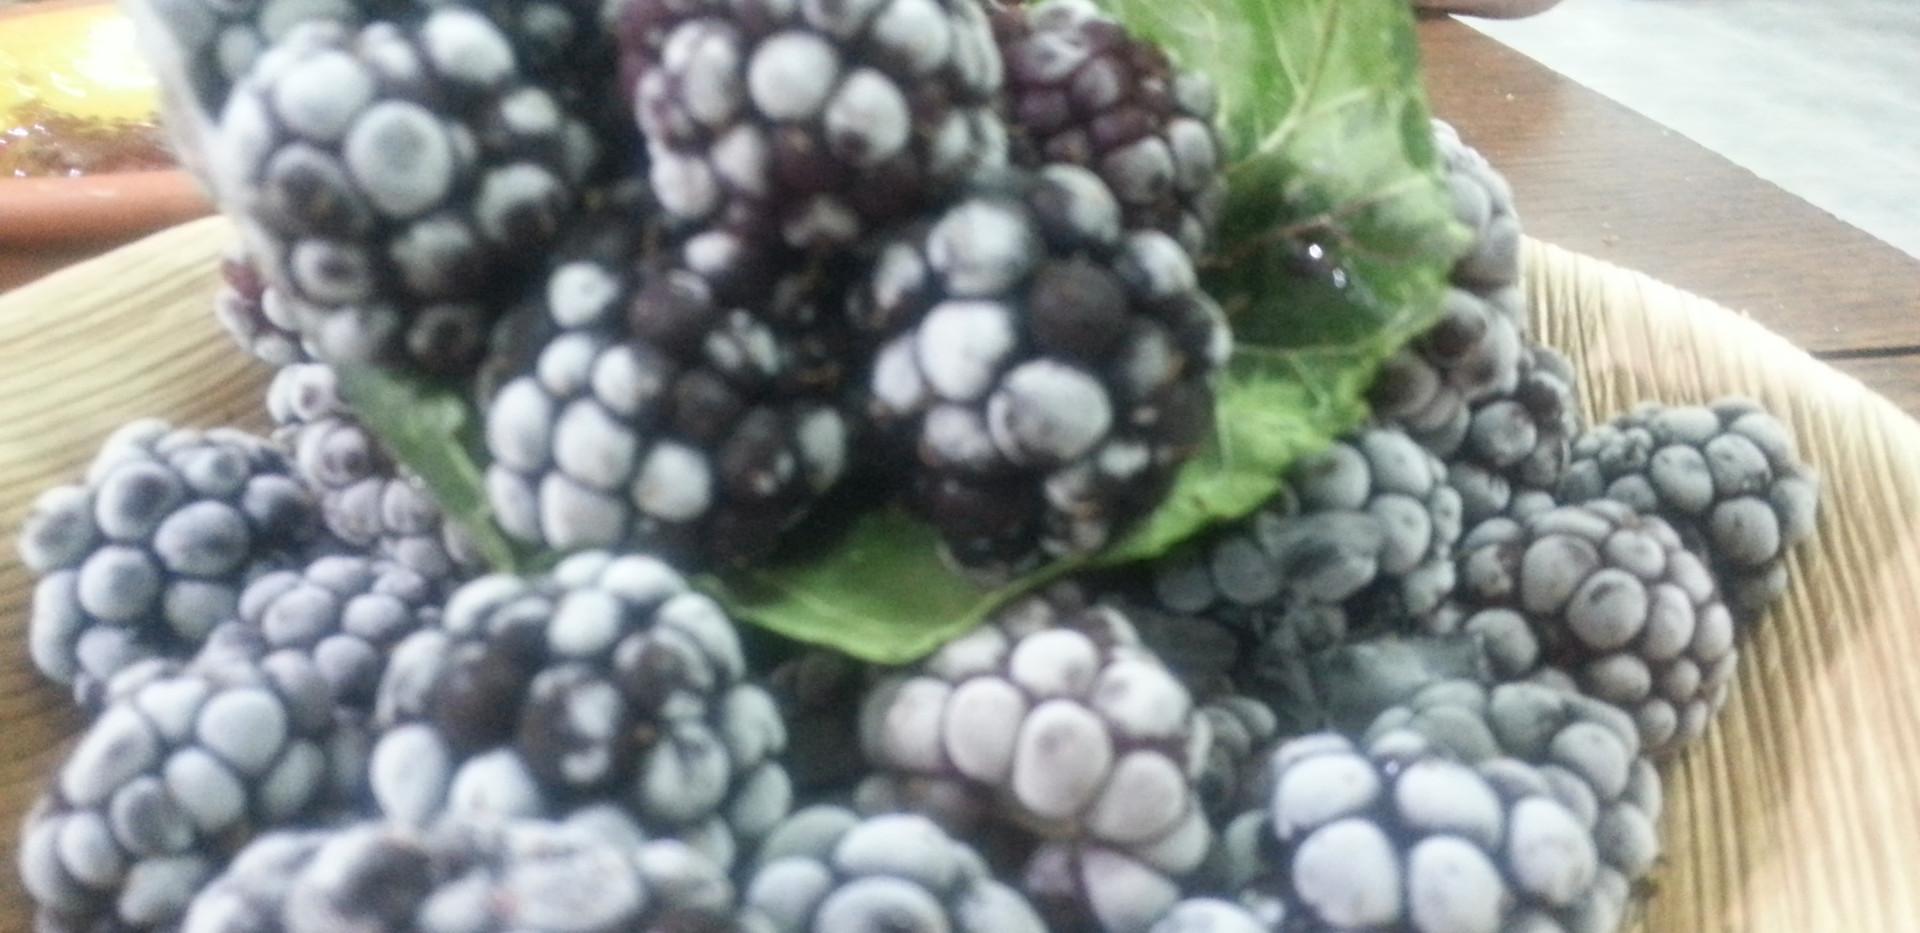 Raspberry on the organic farm